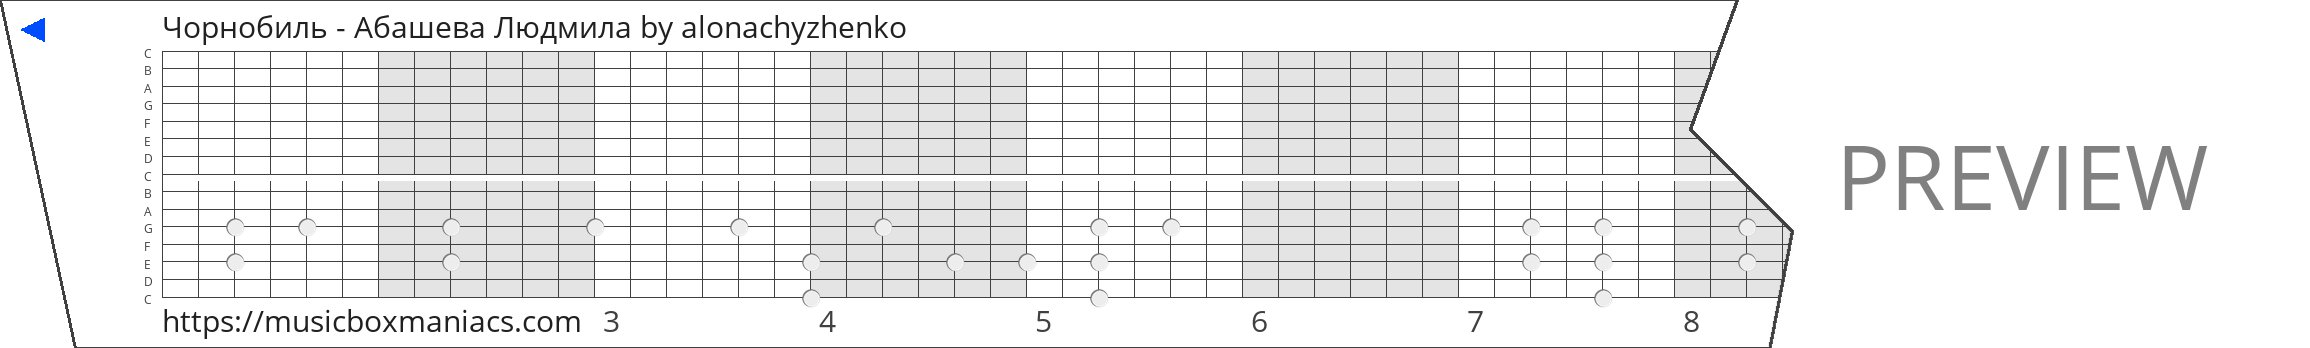 Чорнобиль - Абашева Людмила 15 note music box paper strip